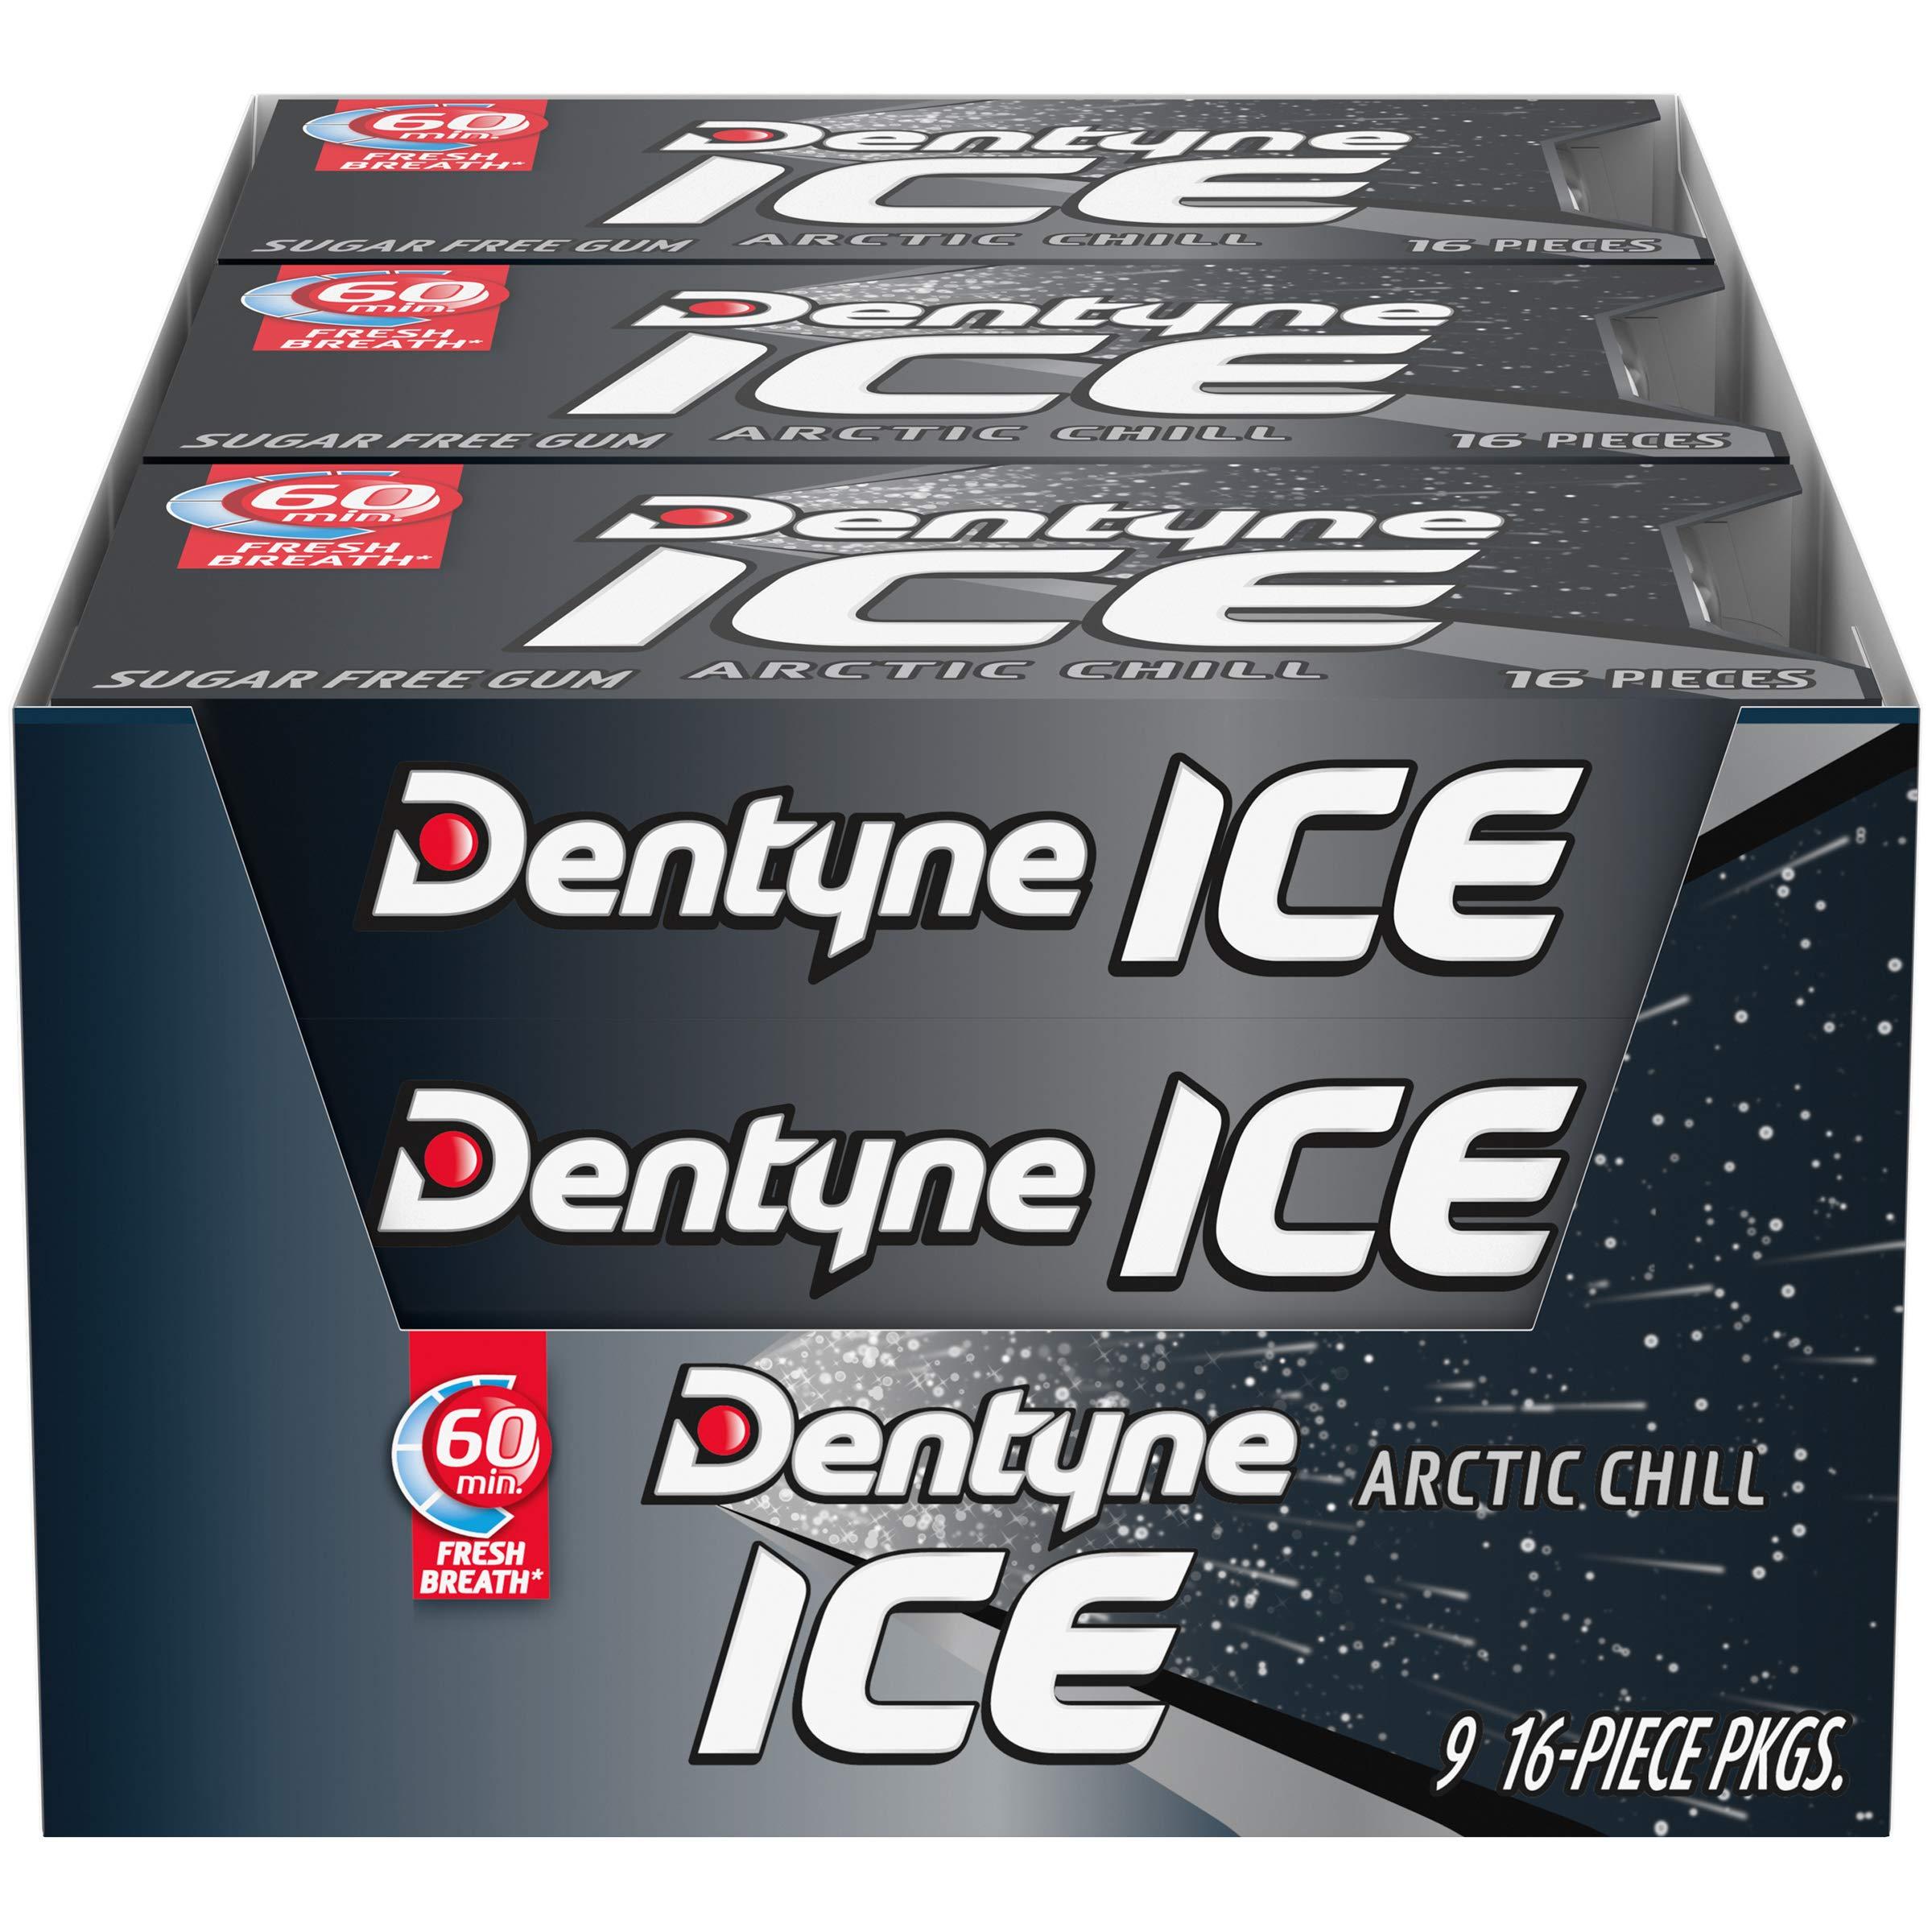 Dentyne Ice Sugar Free Gum (Arctic Chill  16 Piece  Pack of 9) by Dentyne